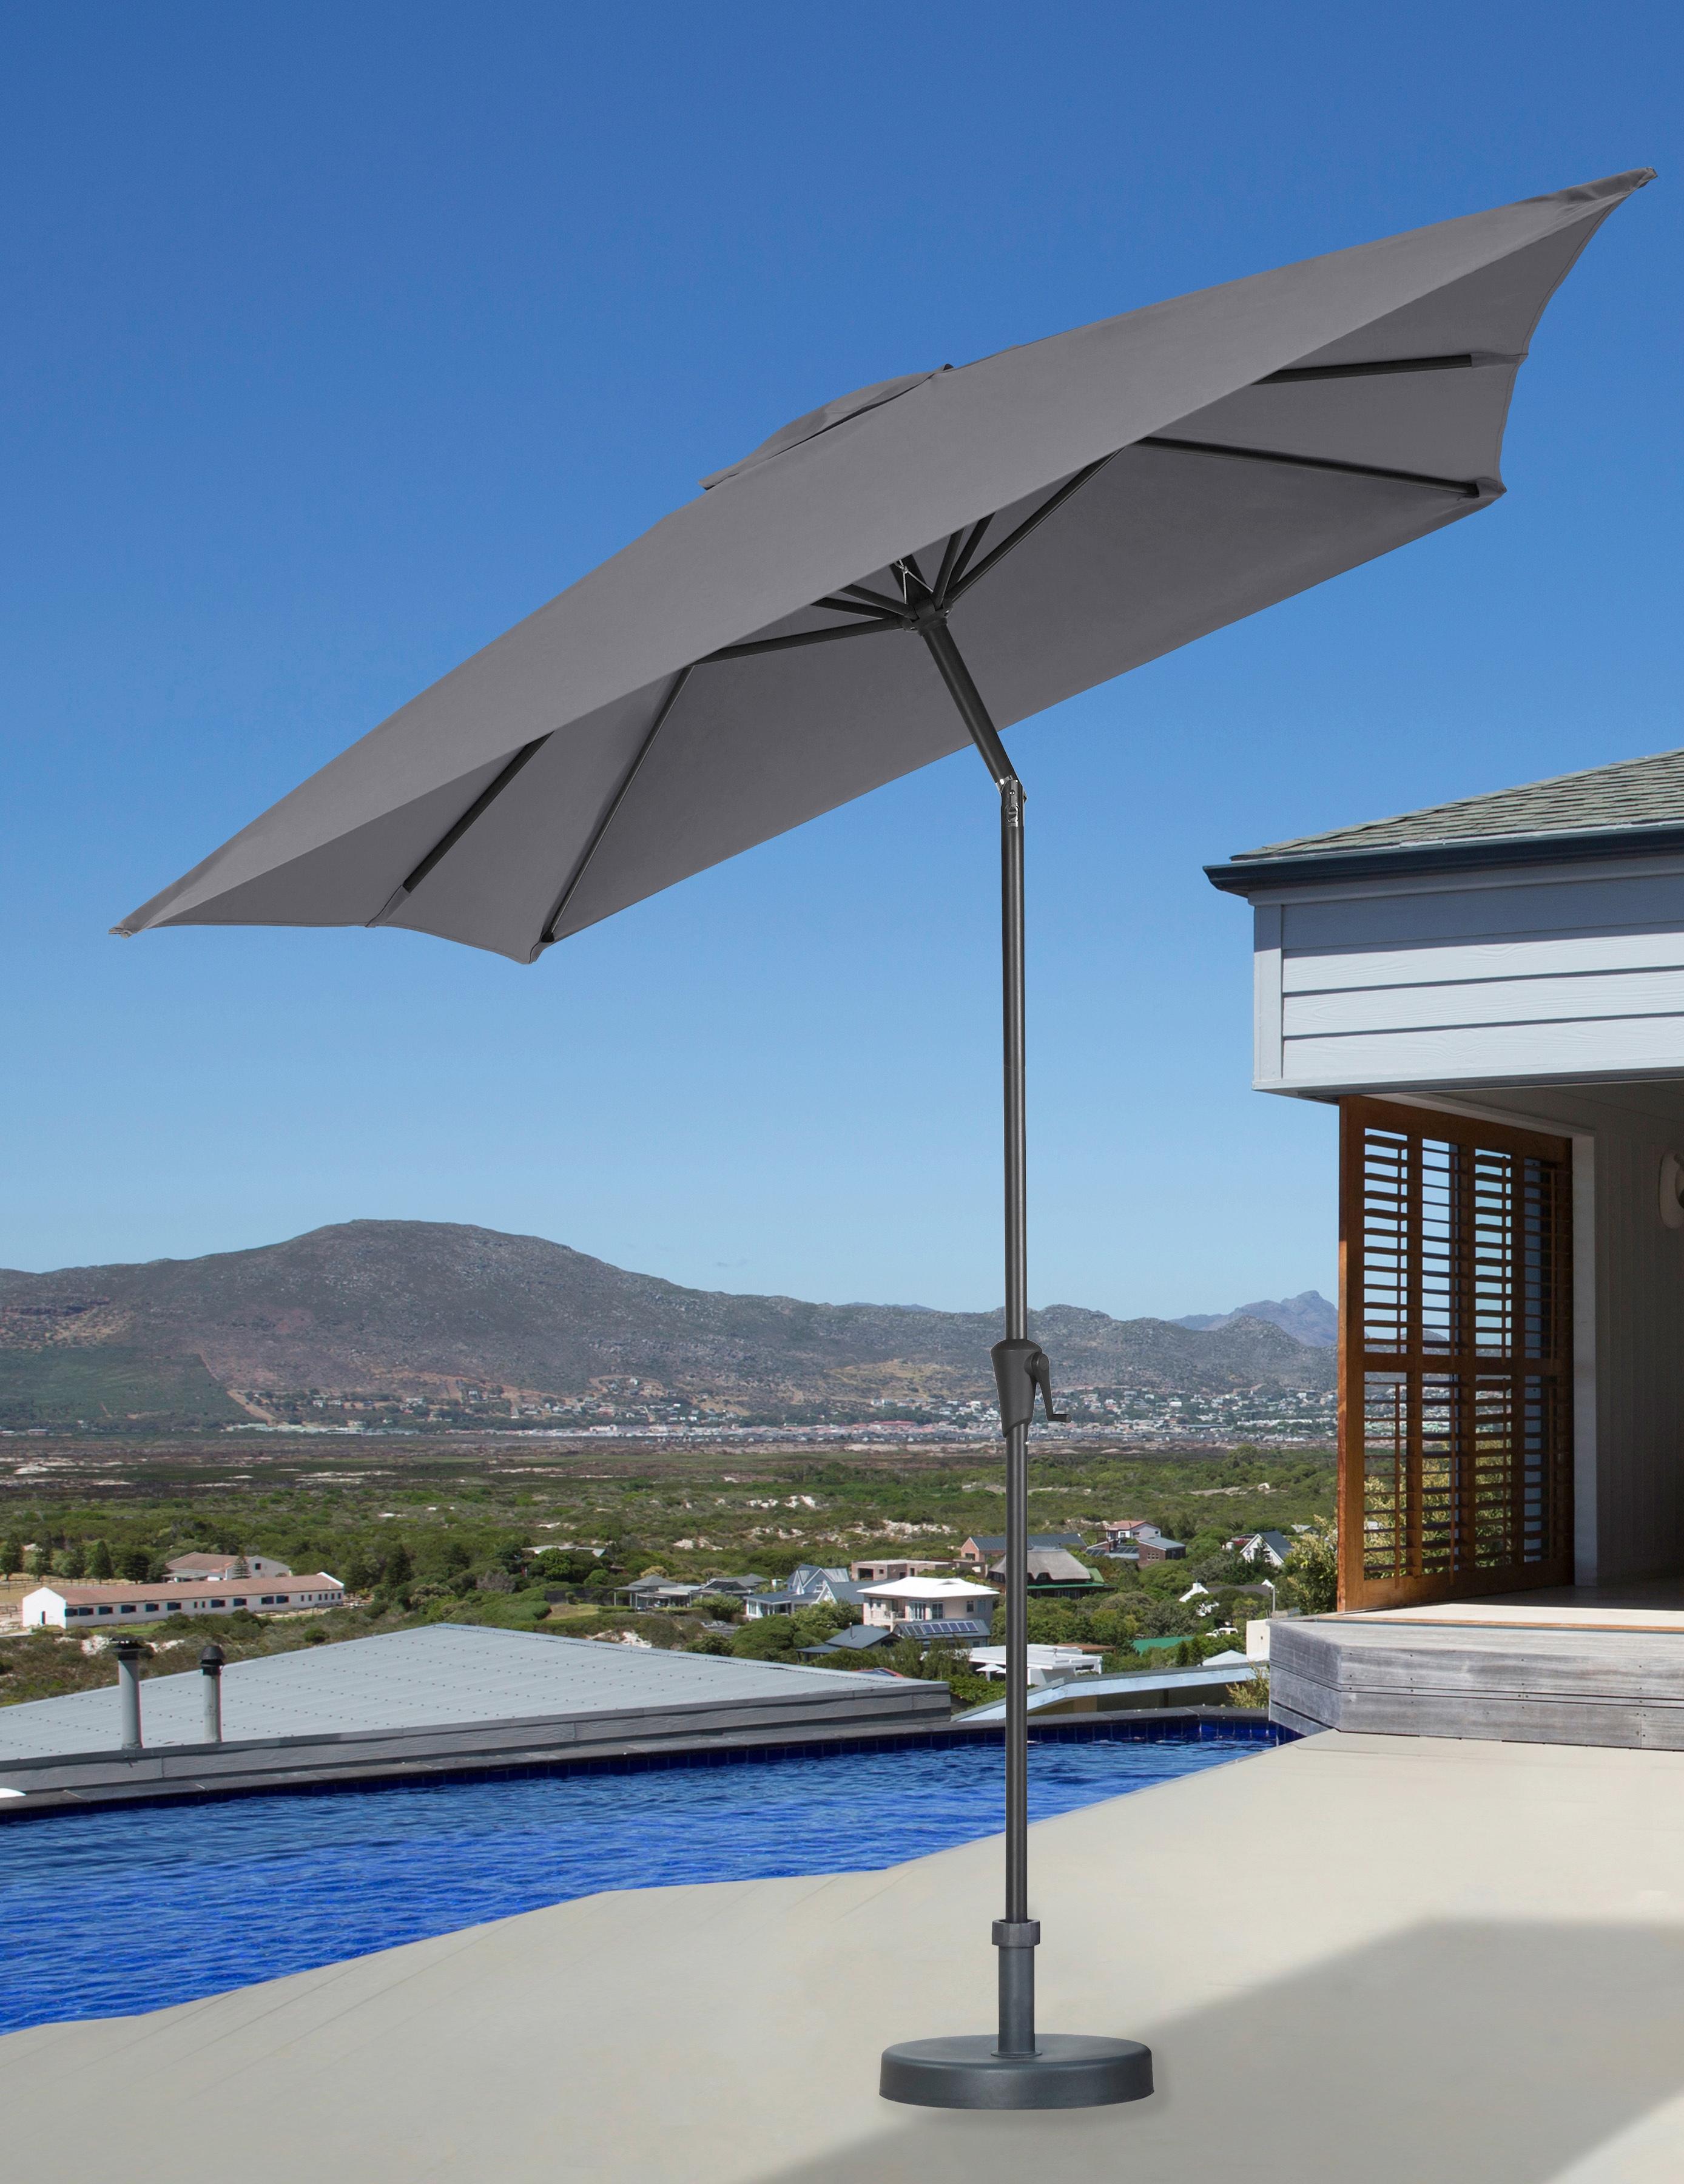 garten gut Sonnenschirm, abknickbar, ohne Schirmständer grau Sonnenschirm Sonnenschirme -segel Gartenmöbel Gartendeko